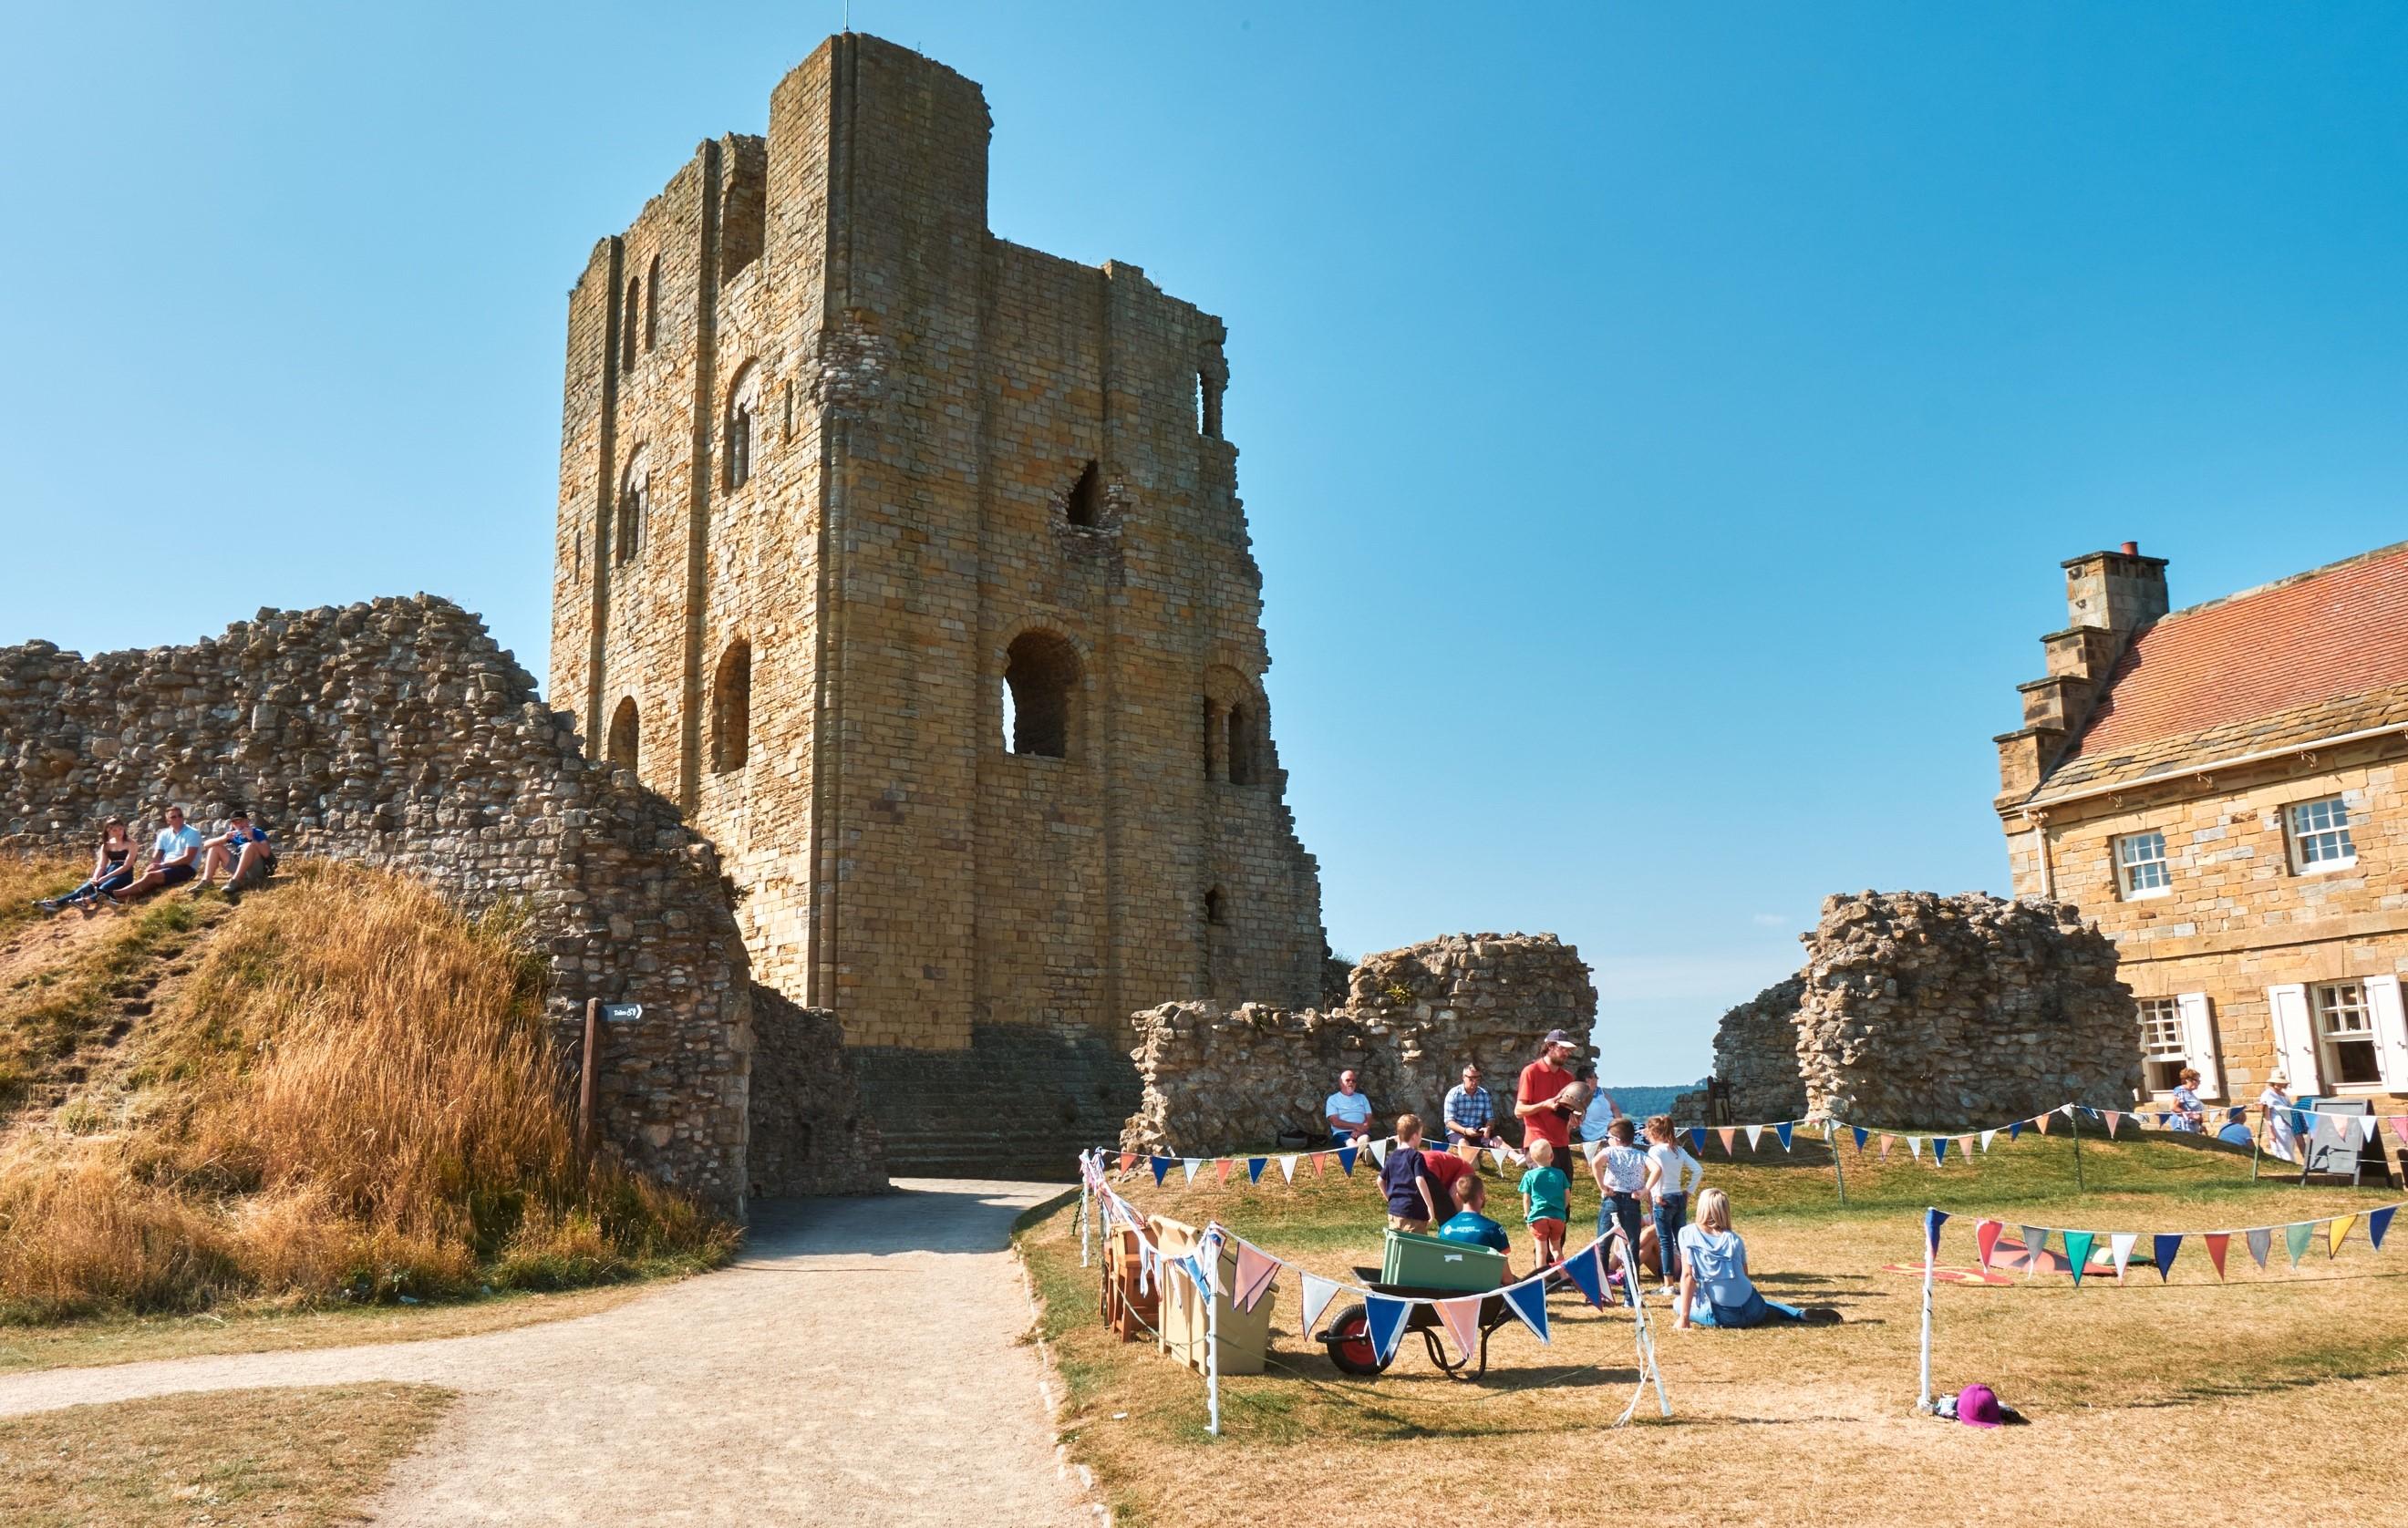 Dog walkers visit Scarborough Castle